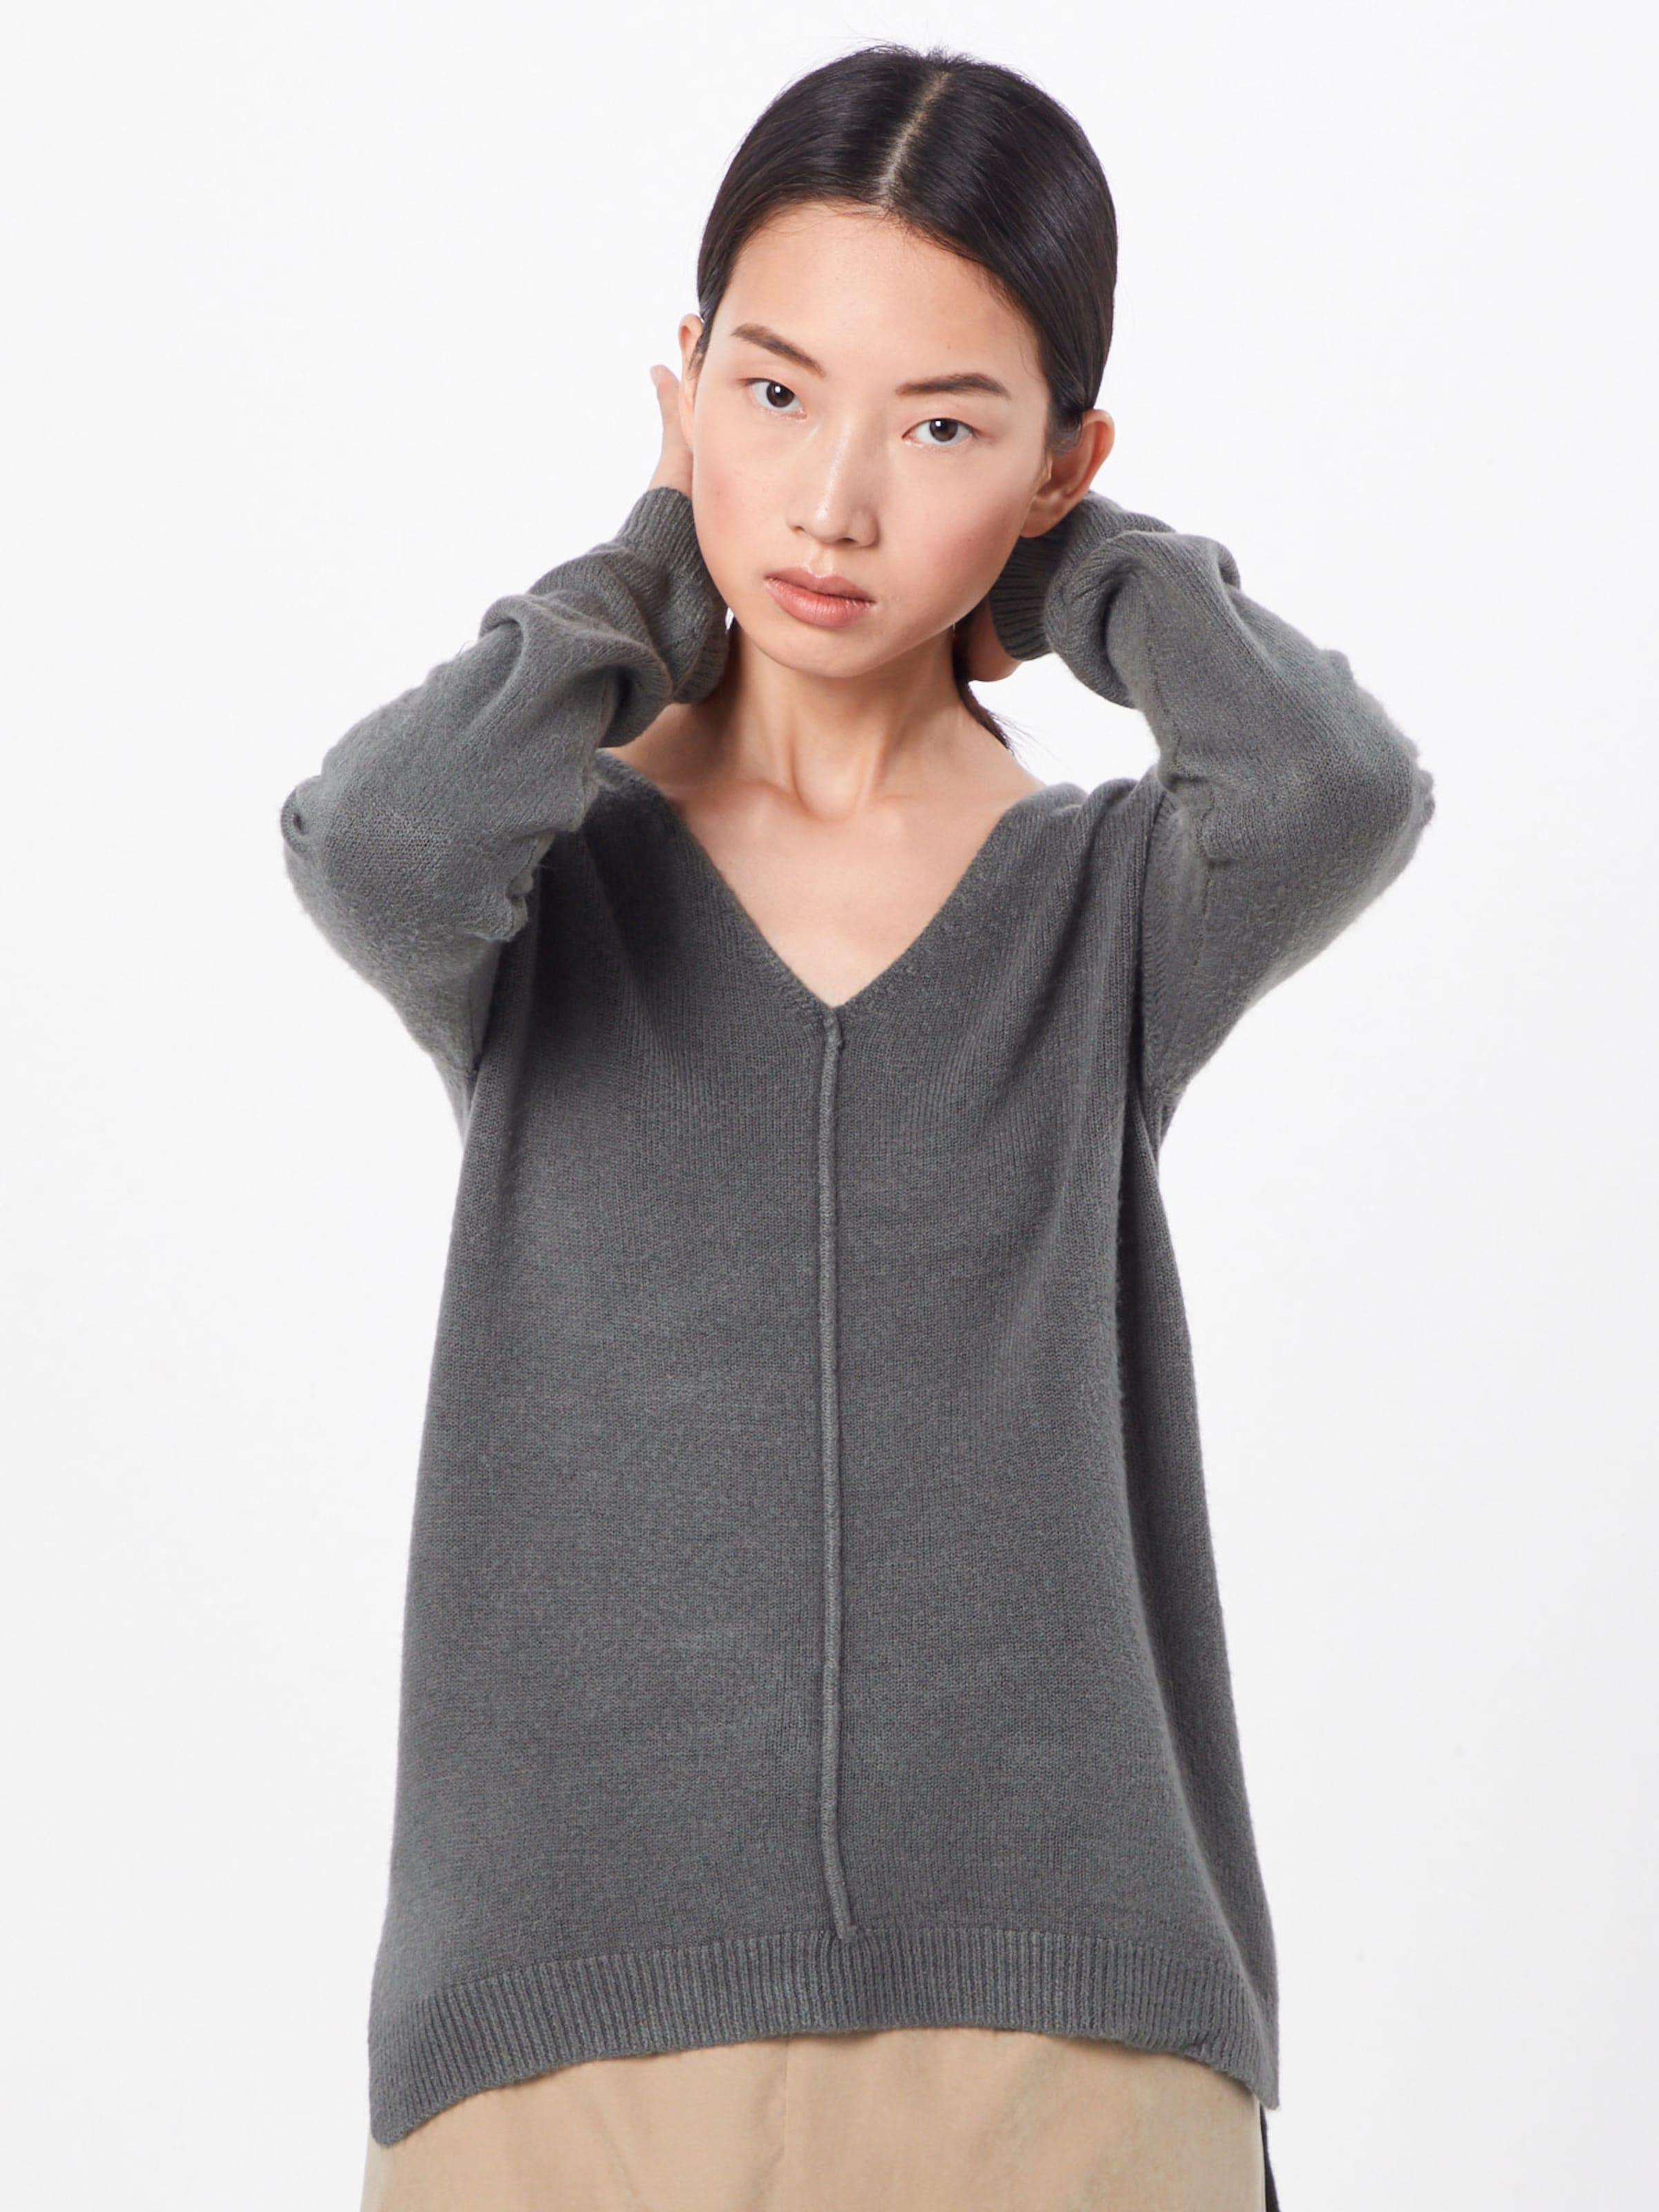 young B 'malea' In Khaki Pullover KclFJT1